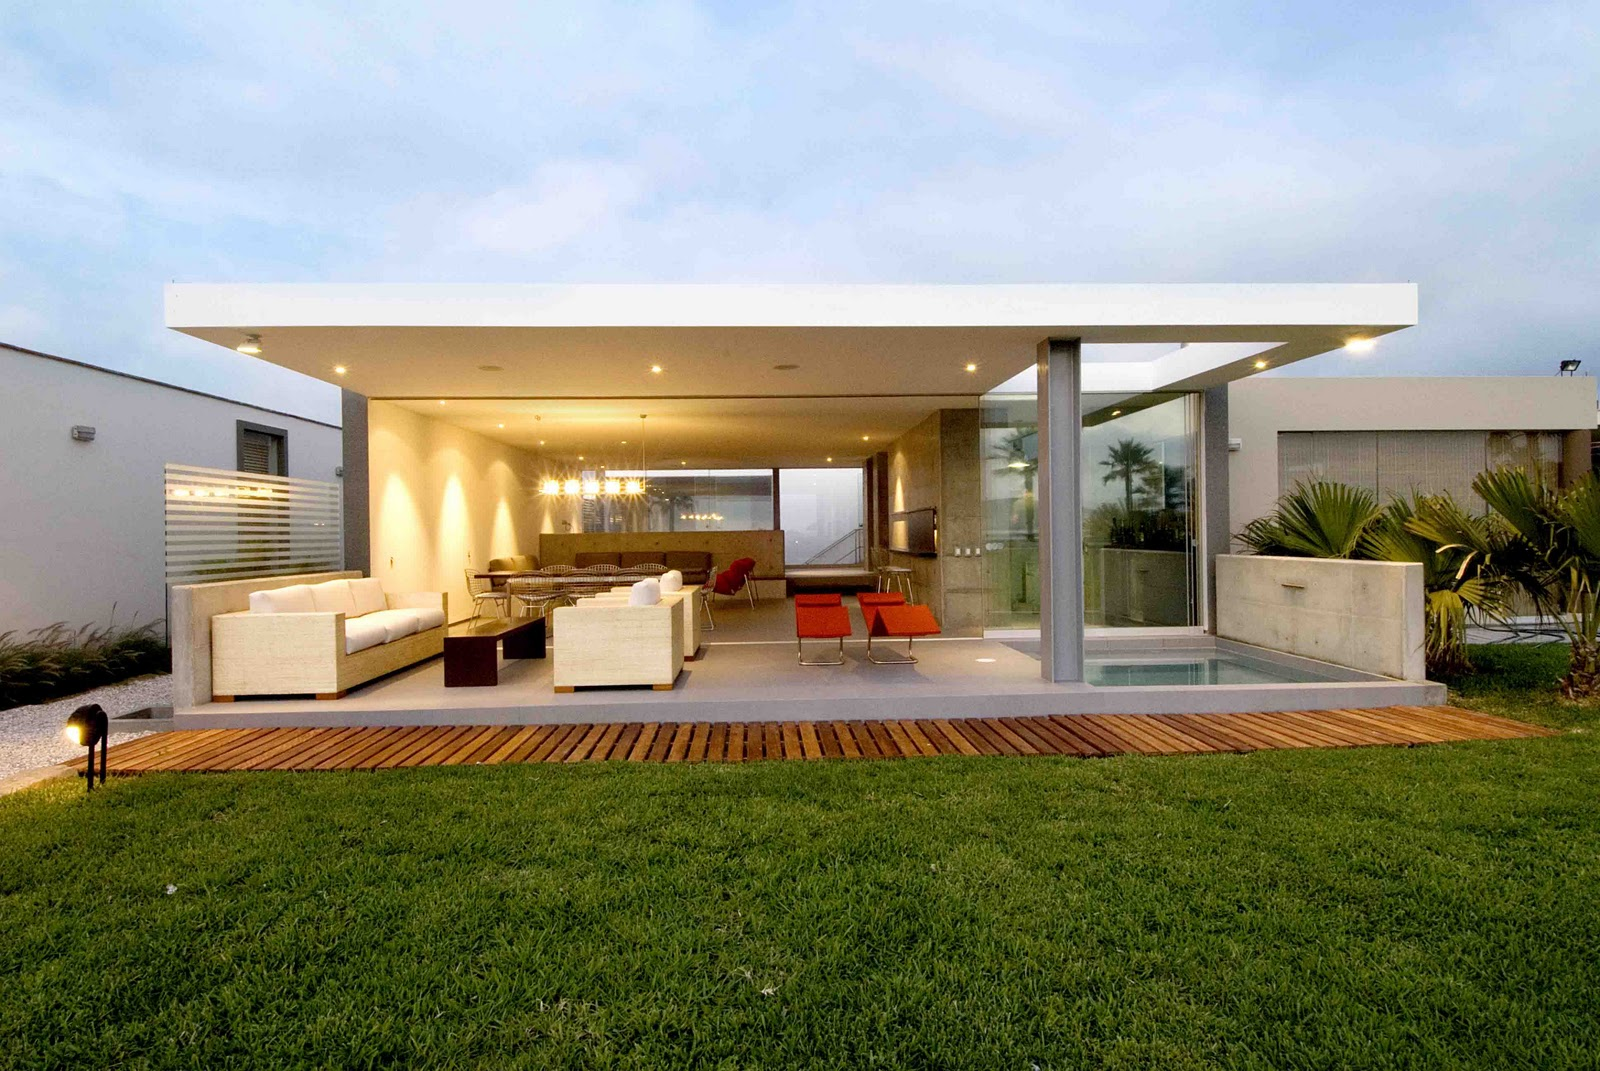 Habitar casa en la isla for Casas minimalistas bonitas